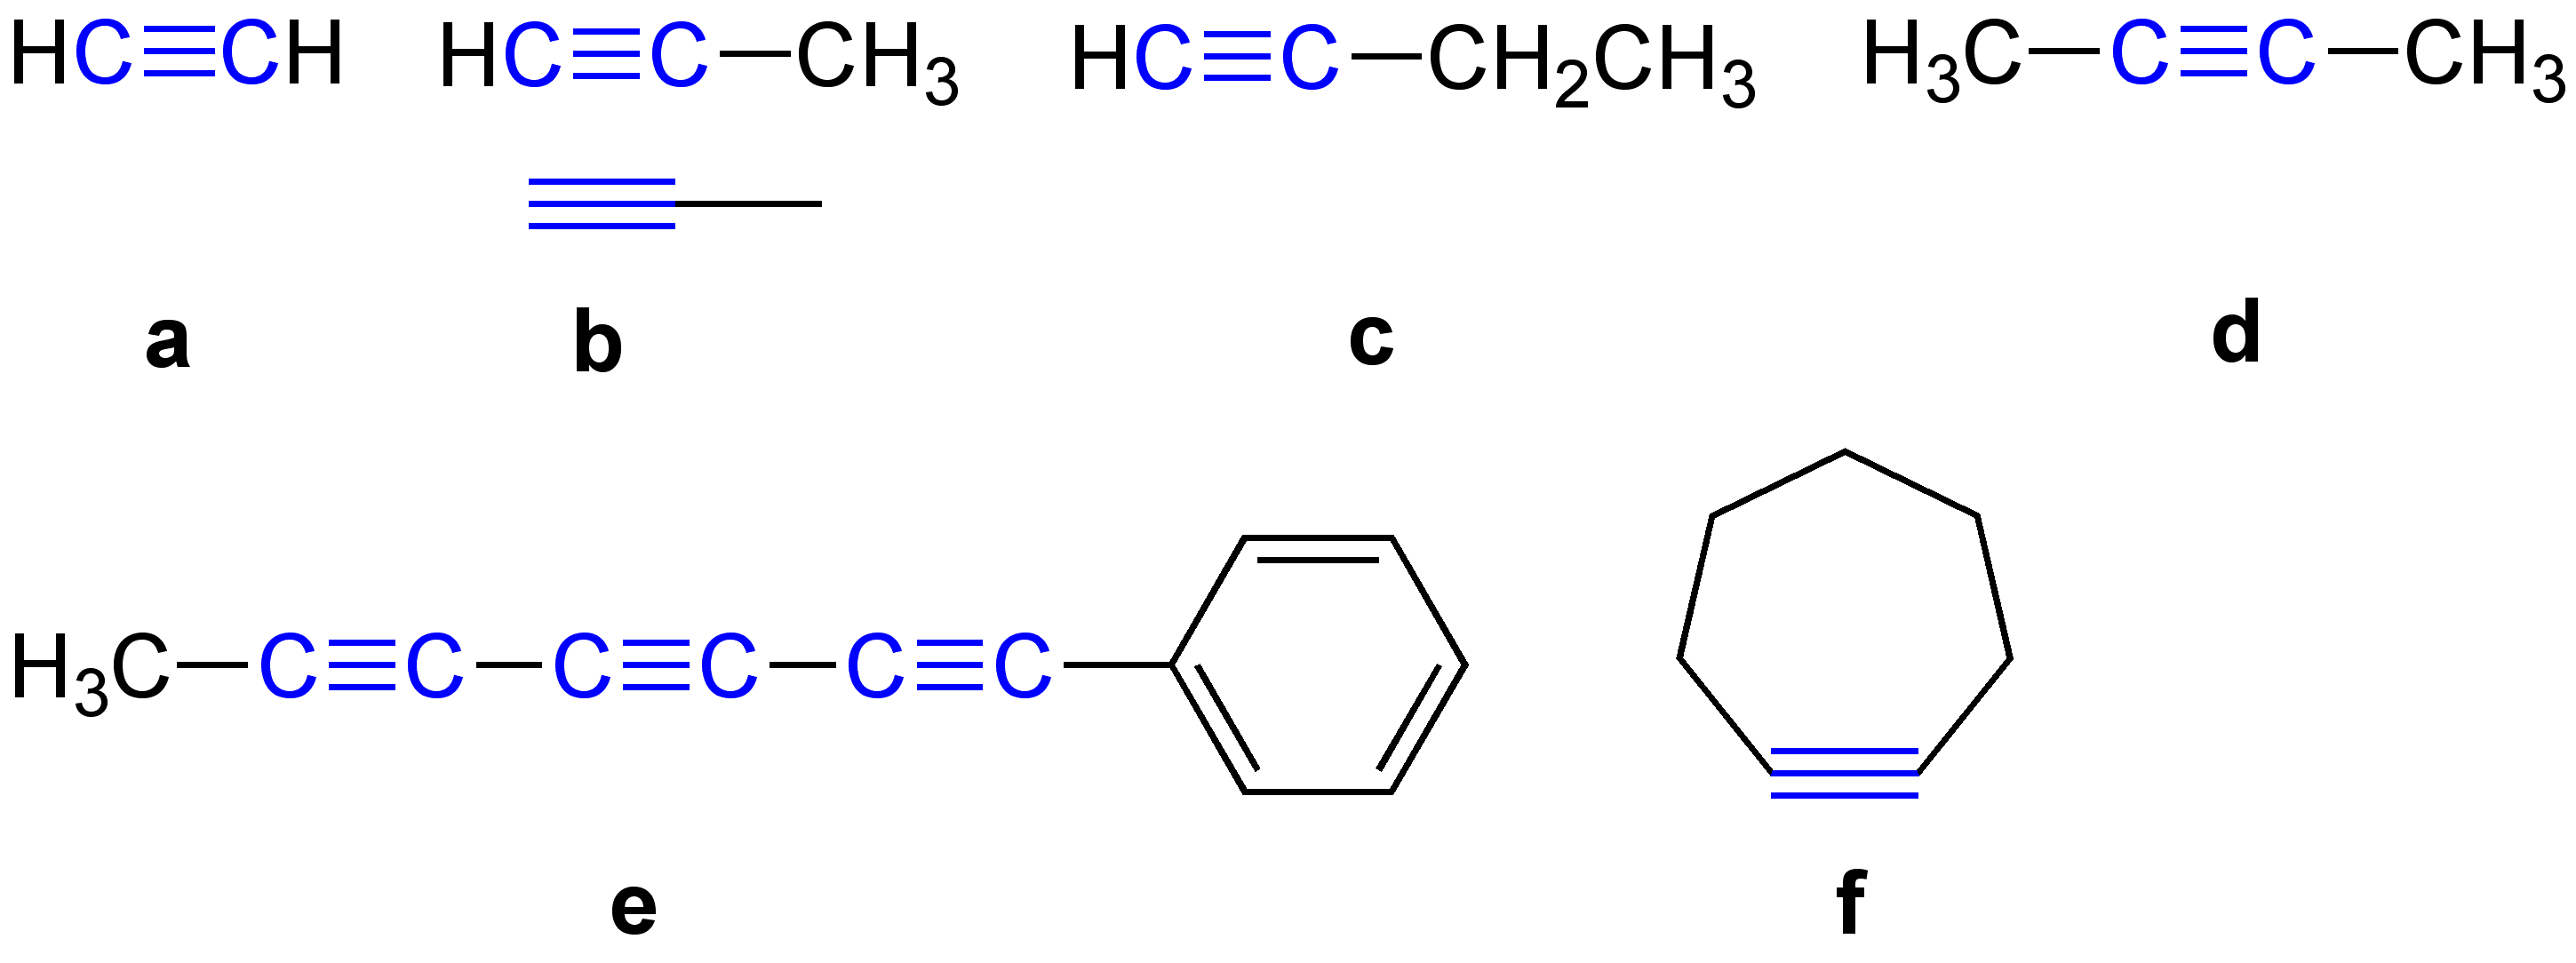 Ficheiro Alkyne General Formulae V 2